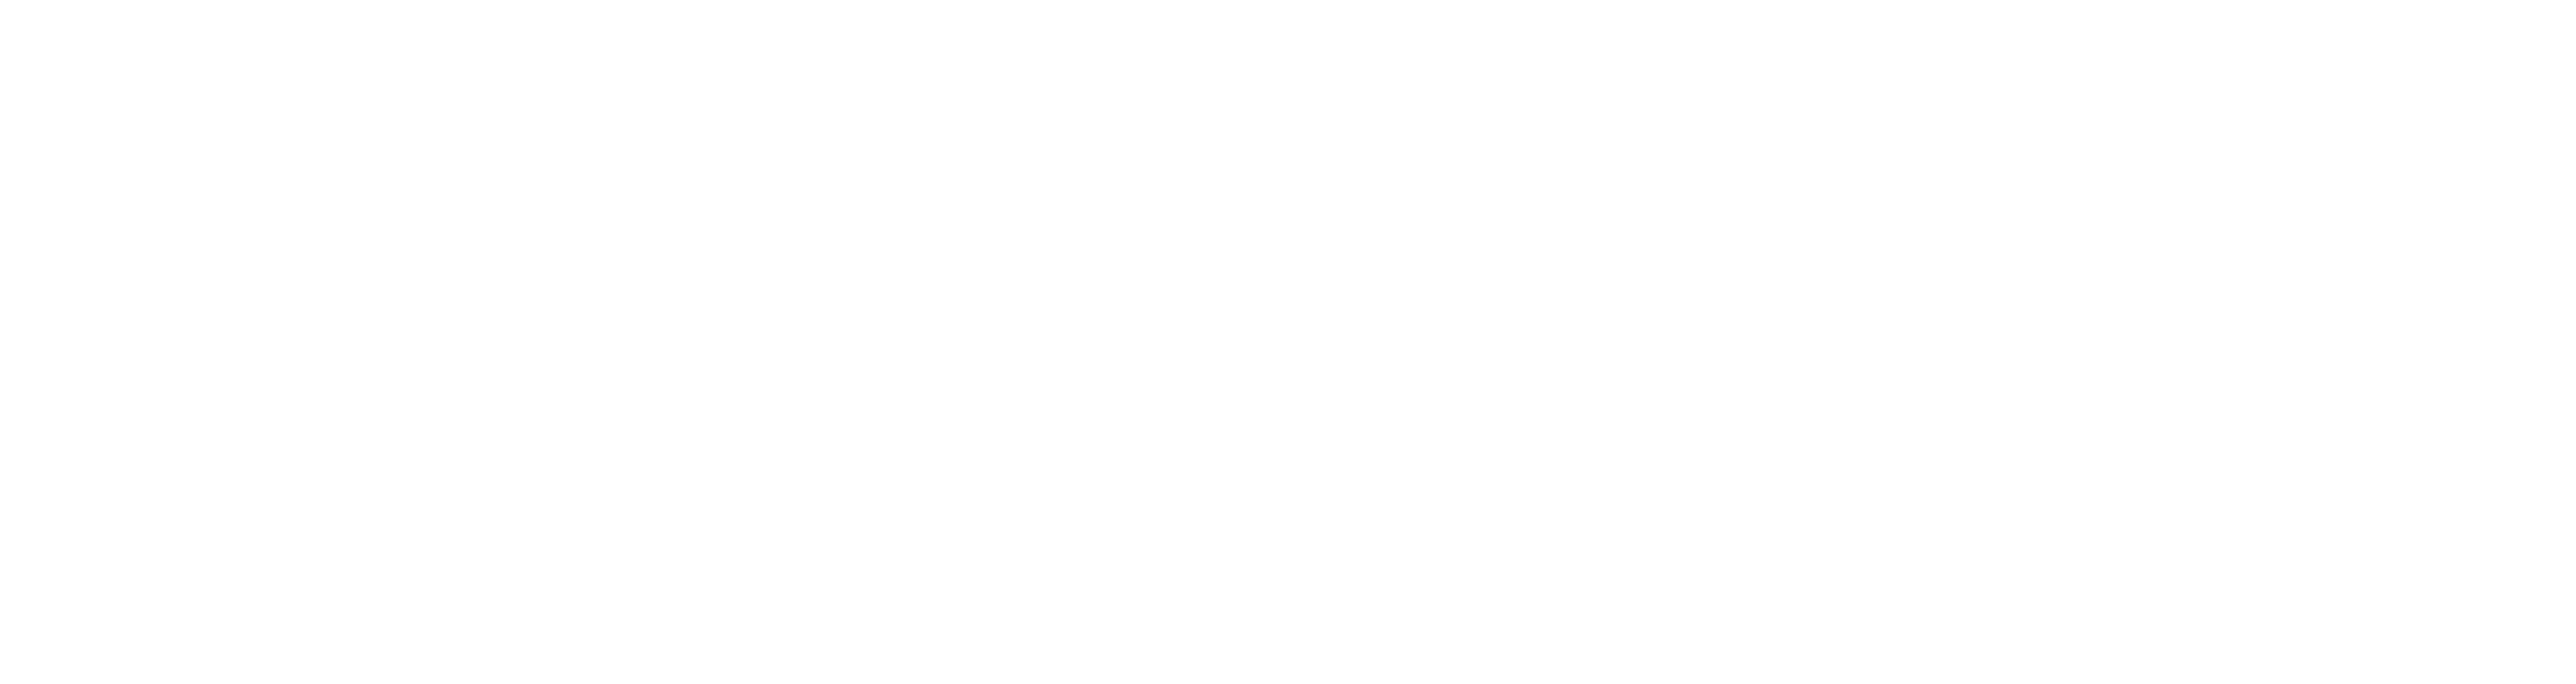 Design a logo to help Southeast Iowa grow